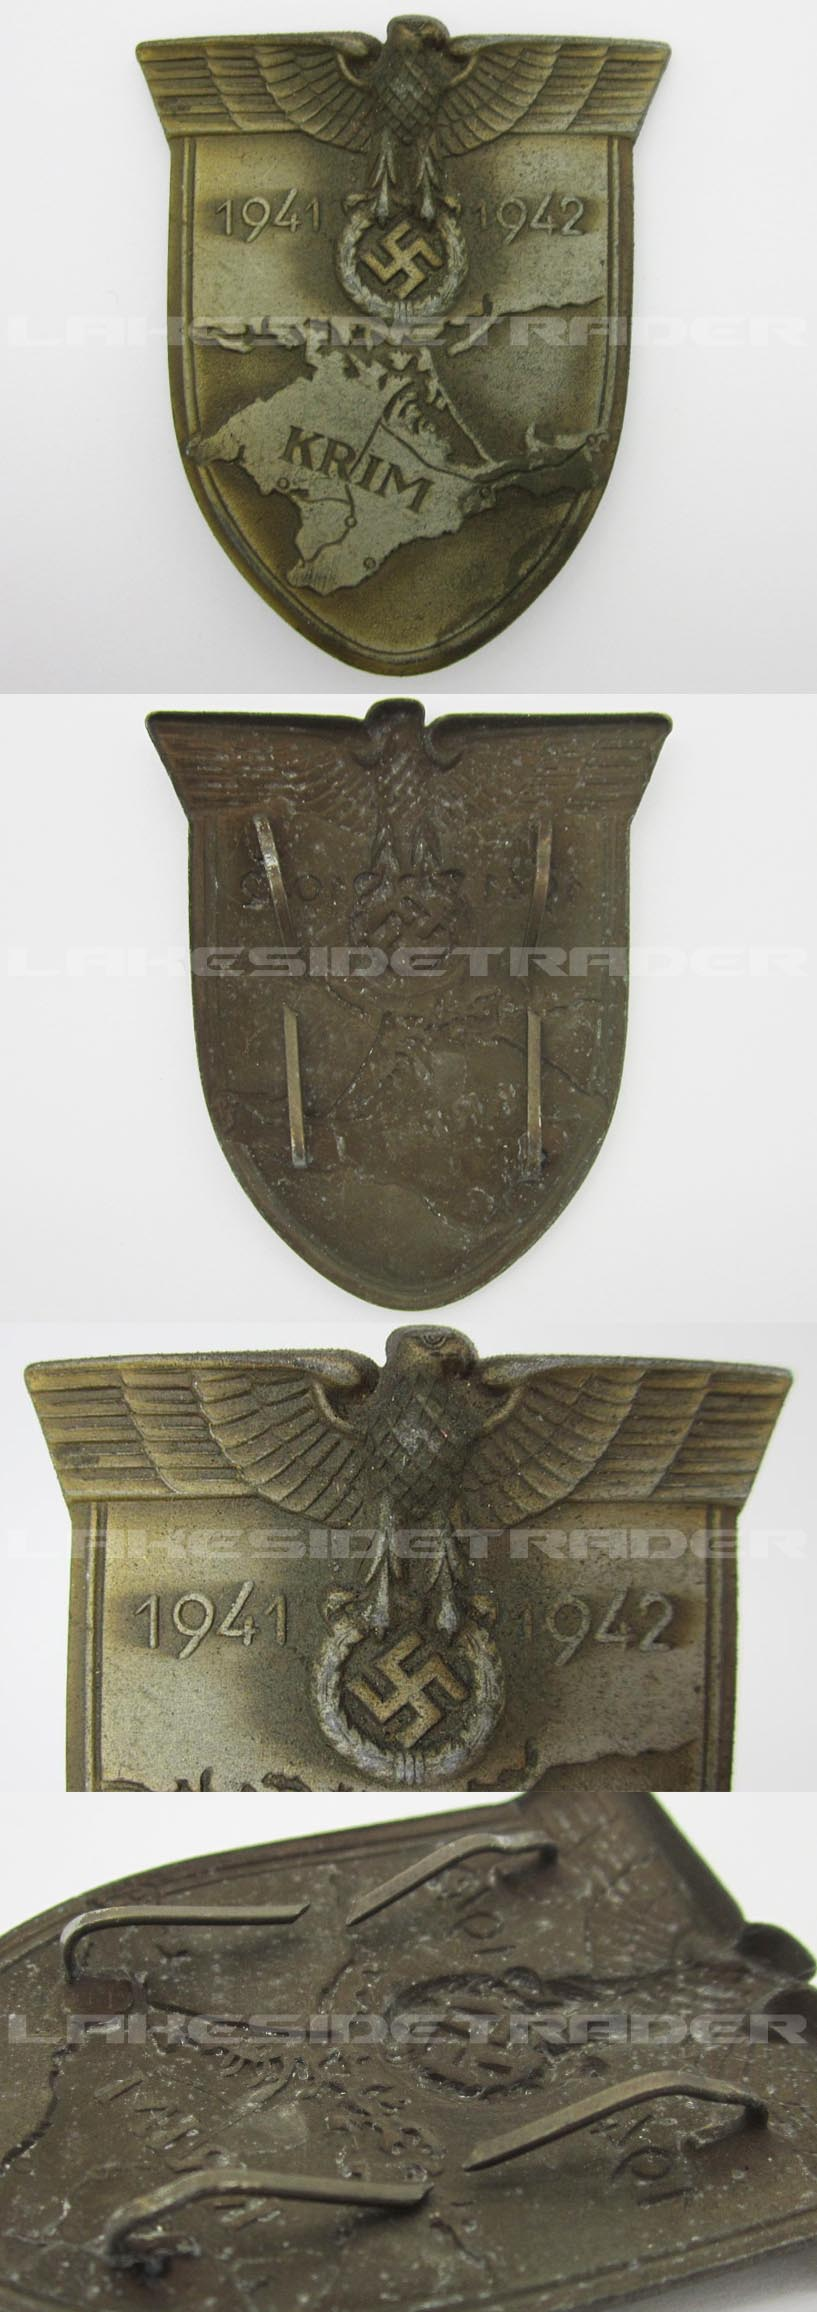 Krim Campaign Arm Shield by W. Deumer